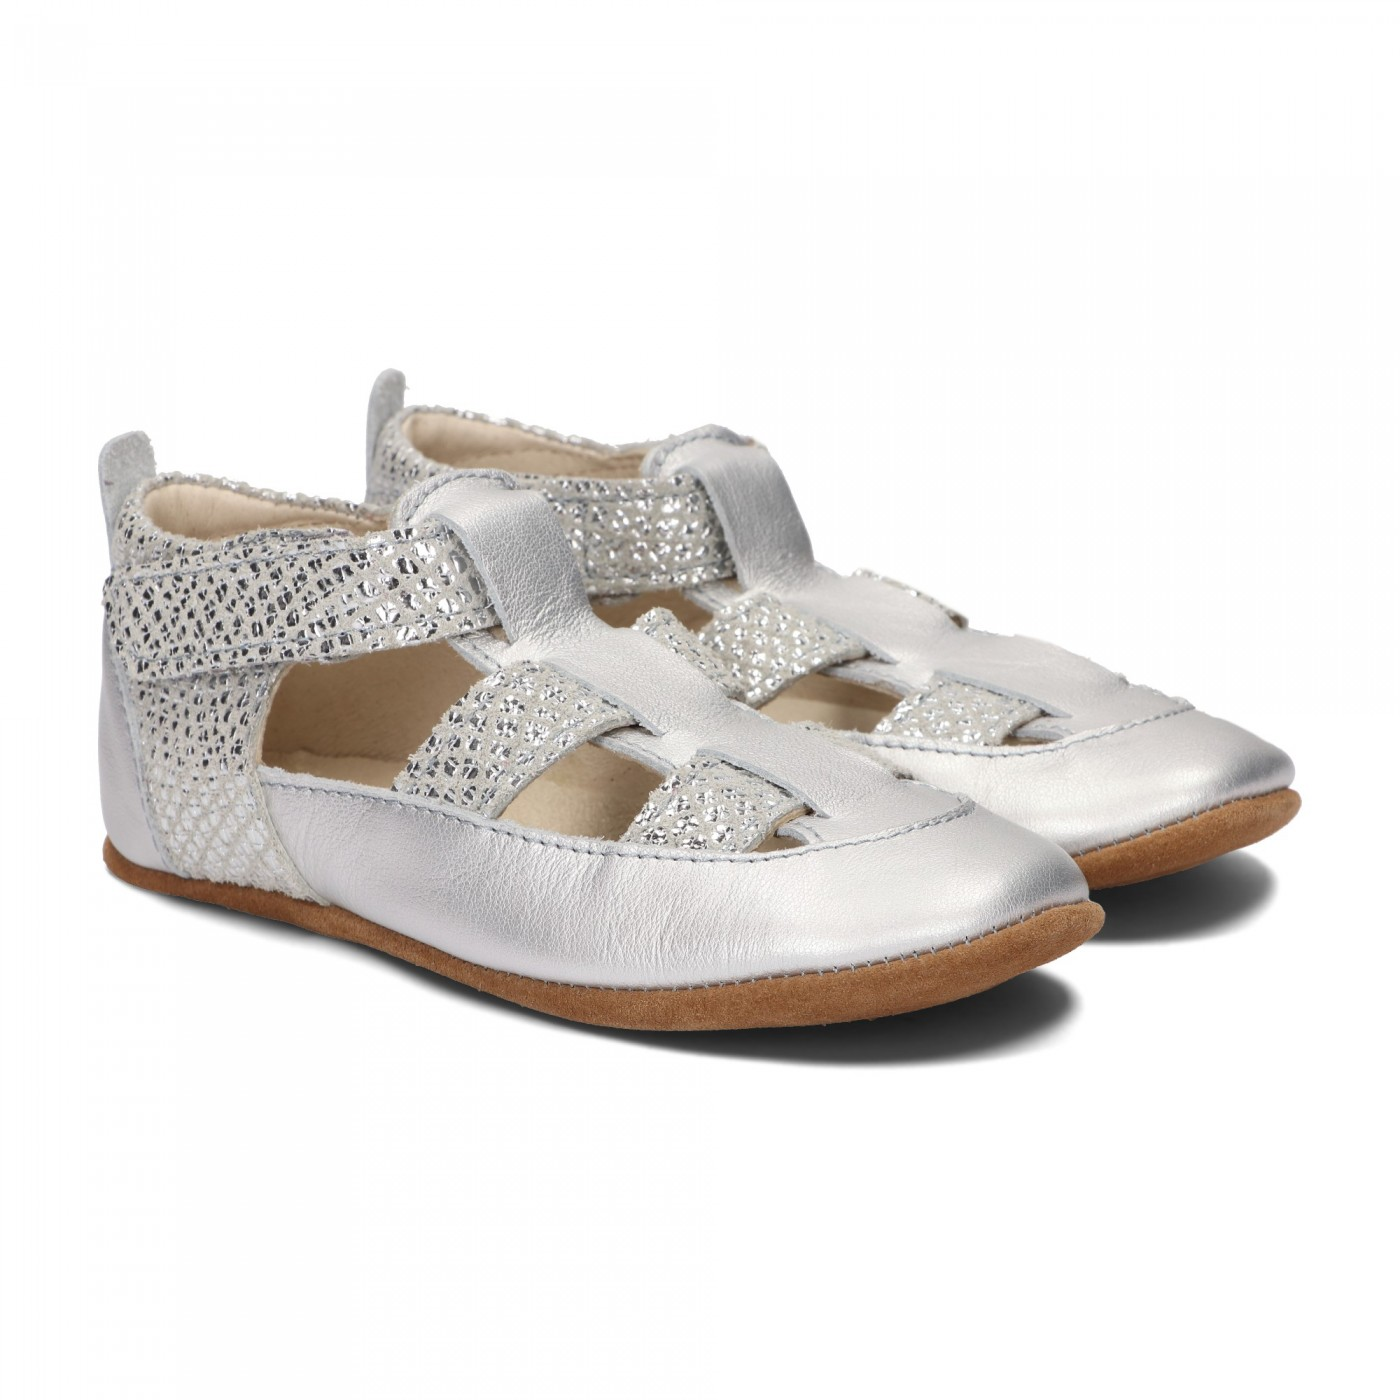 Pantofelki Barefoot srebrny